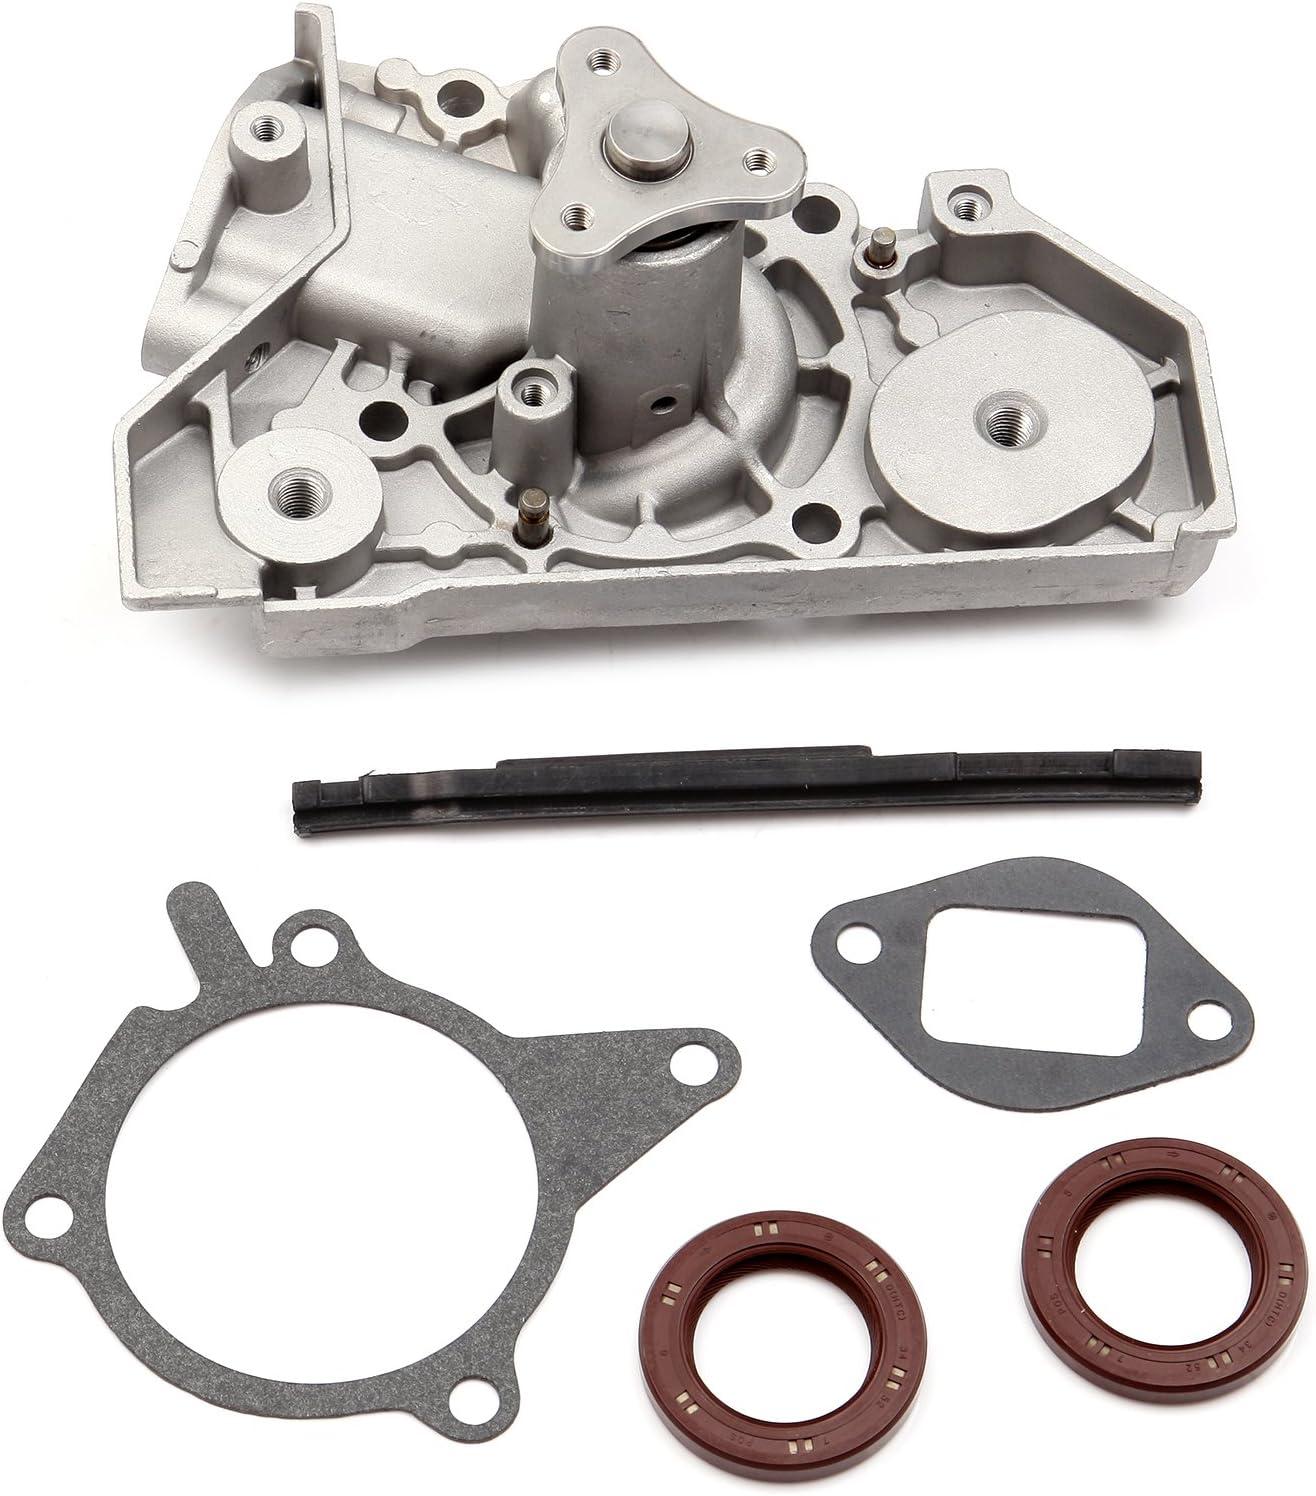 SCITOO Engine Timing Belt Kit Fits 2001-2005 Kia Rio 1.5L 1.6L DOHC 16V Engine A5D A6D